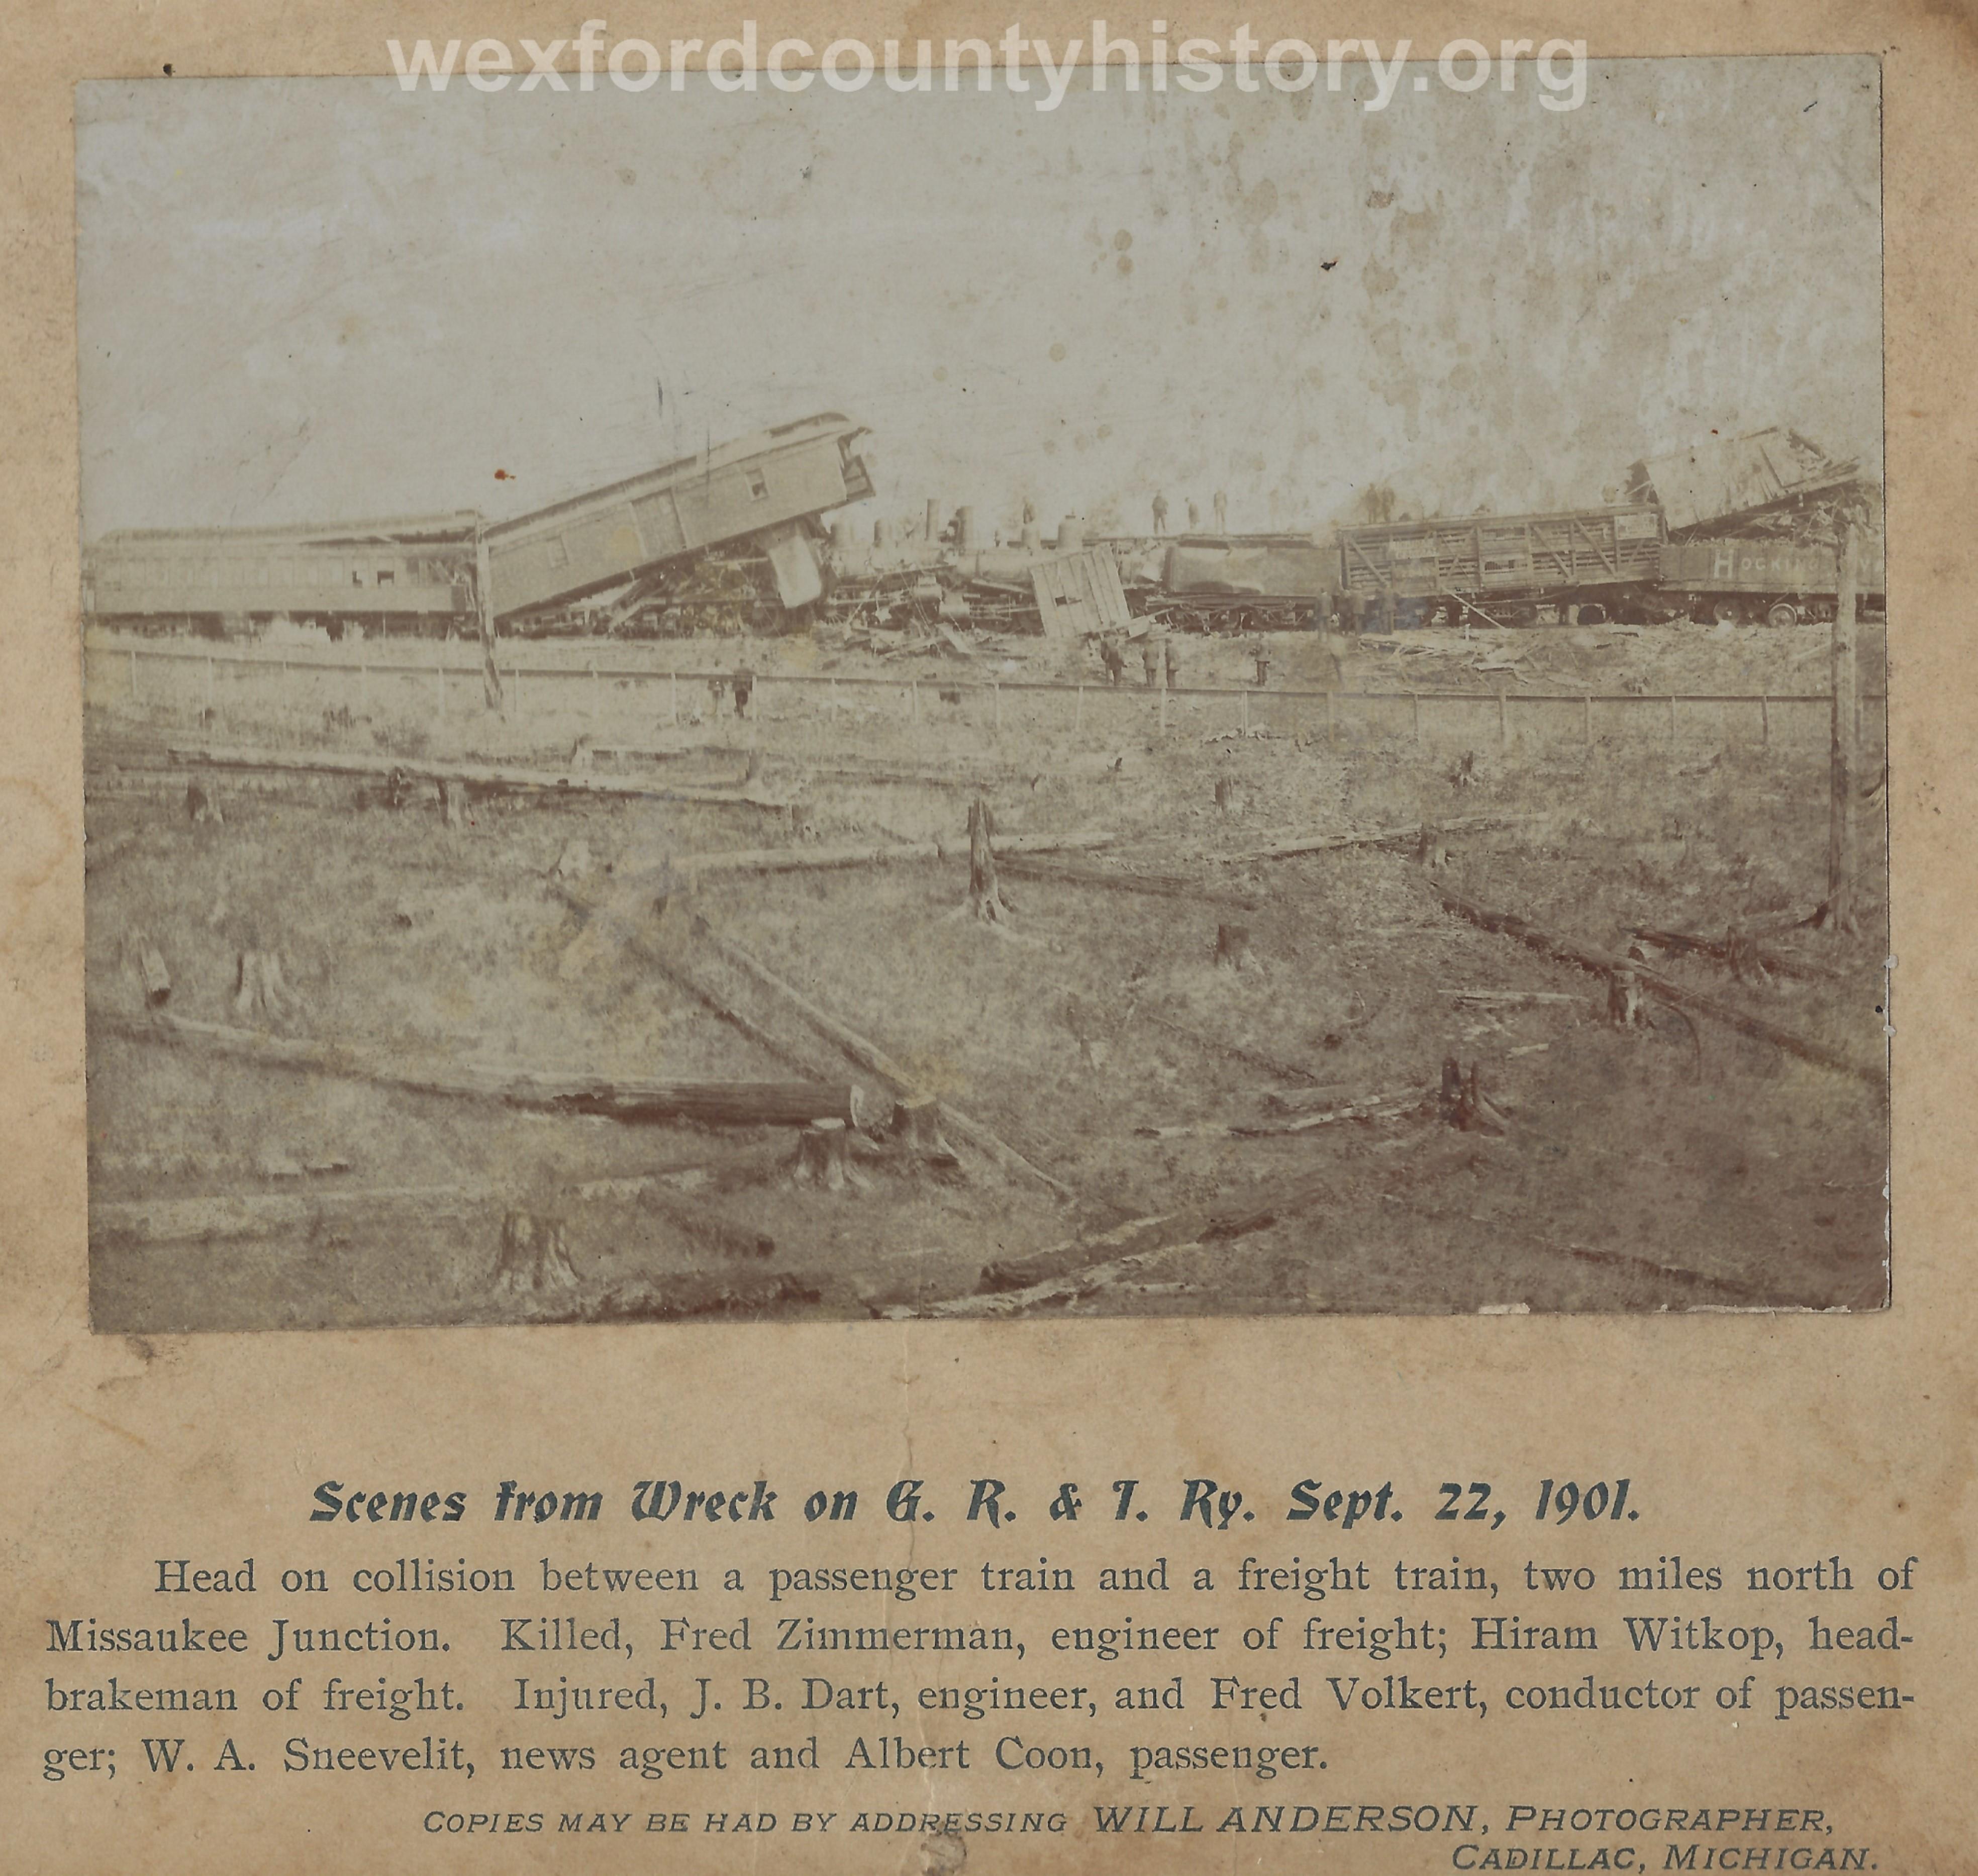 Cadillac-Railroad-1901.09.22-Grand-Rapids-And-Indiana-Wreck-3